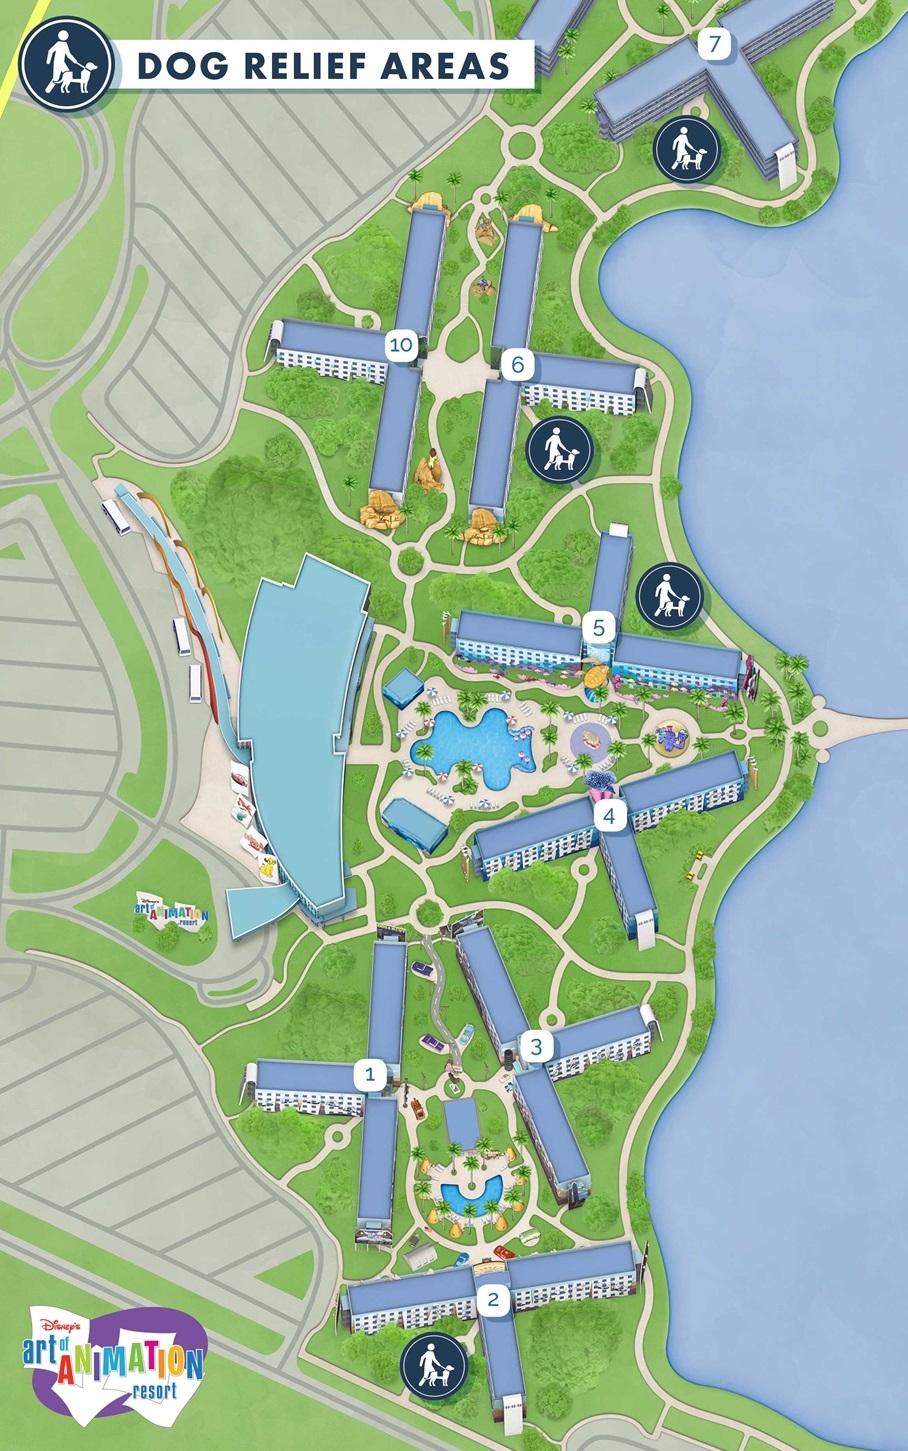 Dog-Friendly-Map-Art-of-Animation - Blog Mickey - Disney News on all star sports map, bay lake tower map, crazy road map, magic kingdom map, boardwalk map, australian animal map, grand floridian map, art and animation, art in animation, wilderness lodge map, art of disney, best world map, disney world map, downtown disney map, pop century map, coronado springs map, all-star disney hotel map, animal kingdom map, caribbean beach map, usa map,